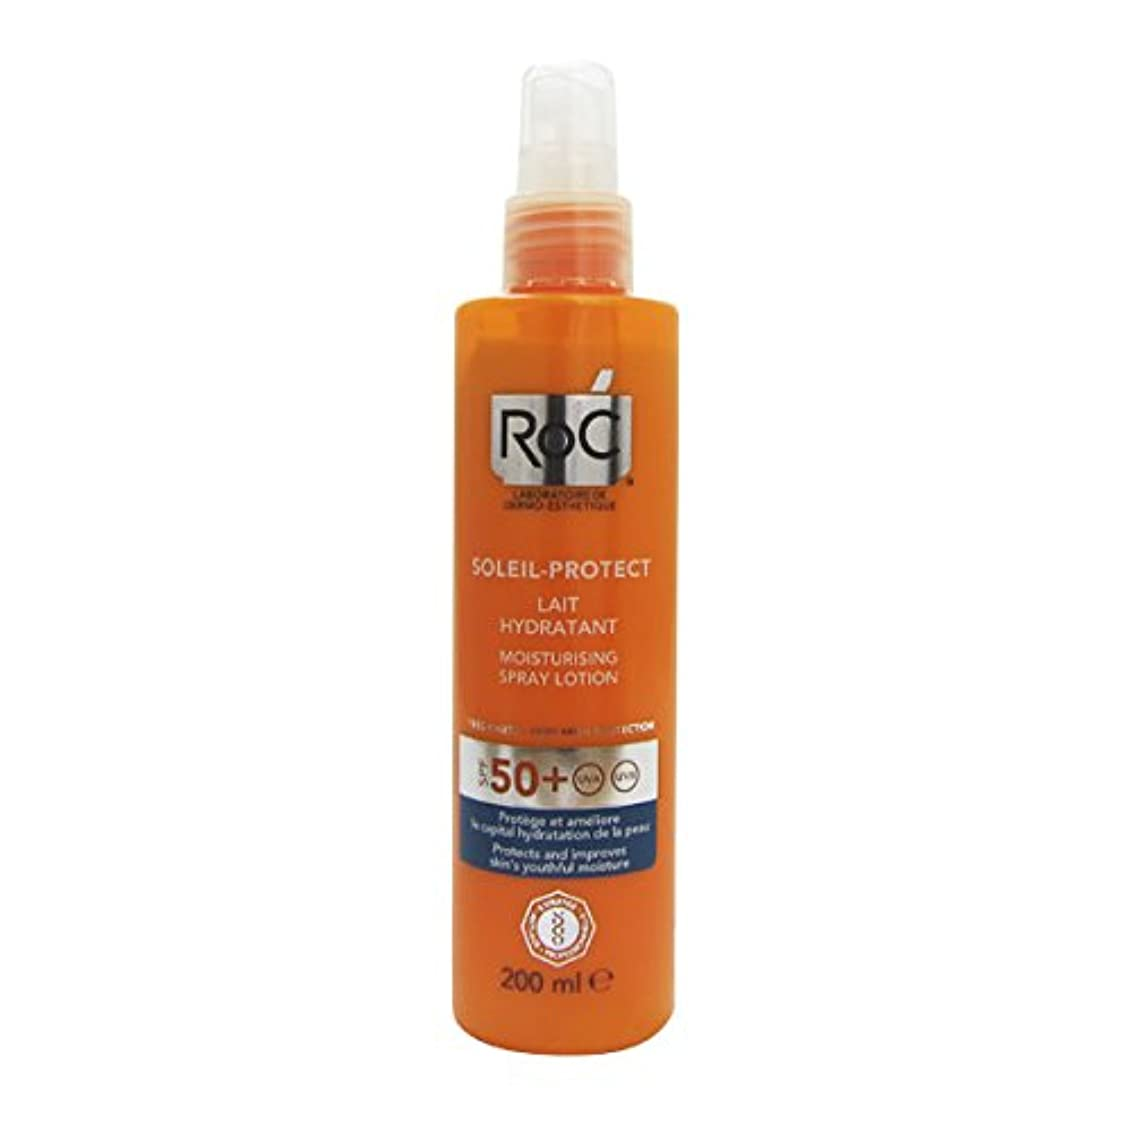 Roc Soleil Protect Hydrating Fluid Spf30 200ml [並行輸入品]